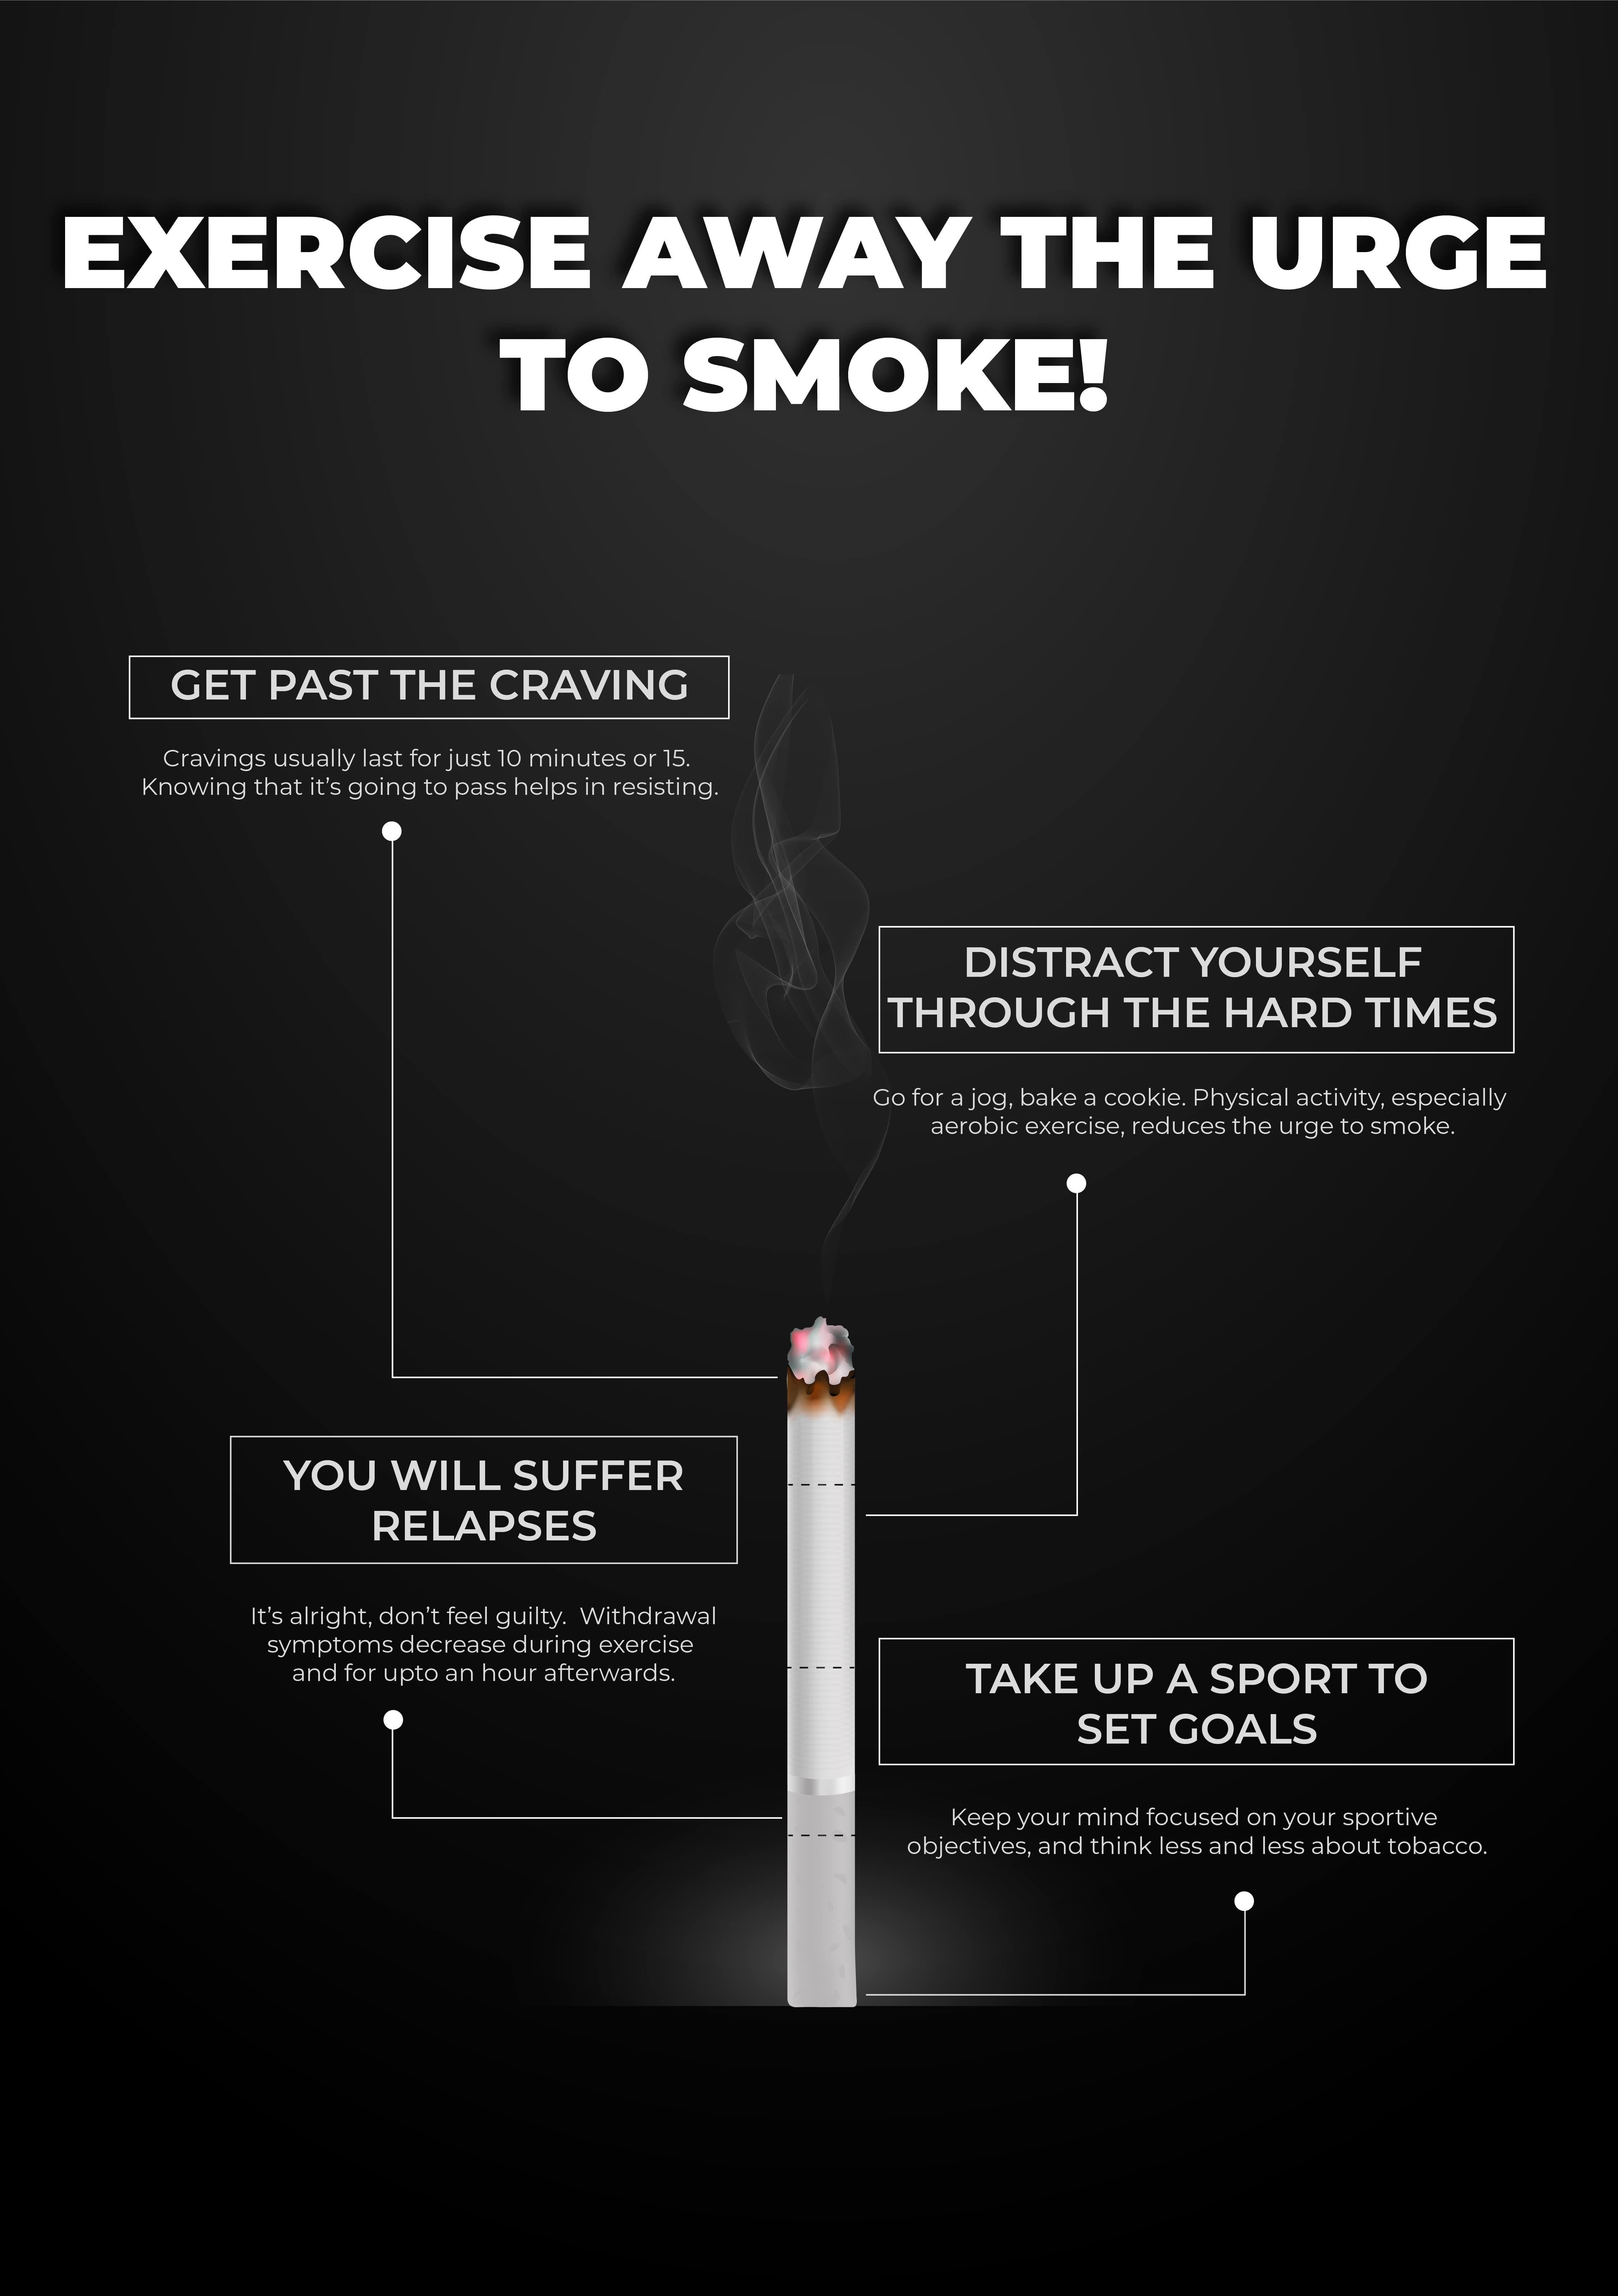 Exercise away the urge to smoke